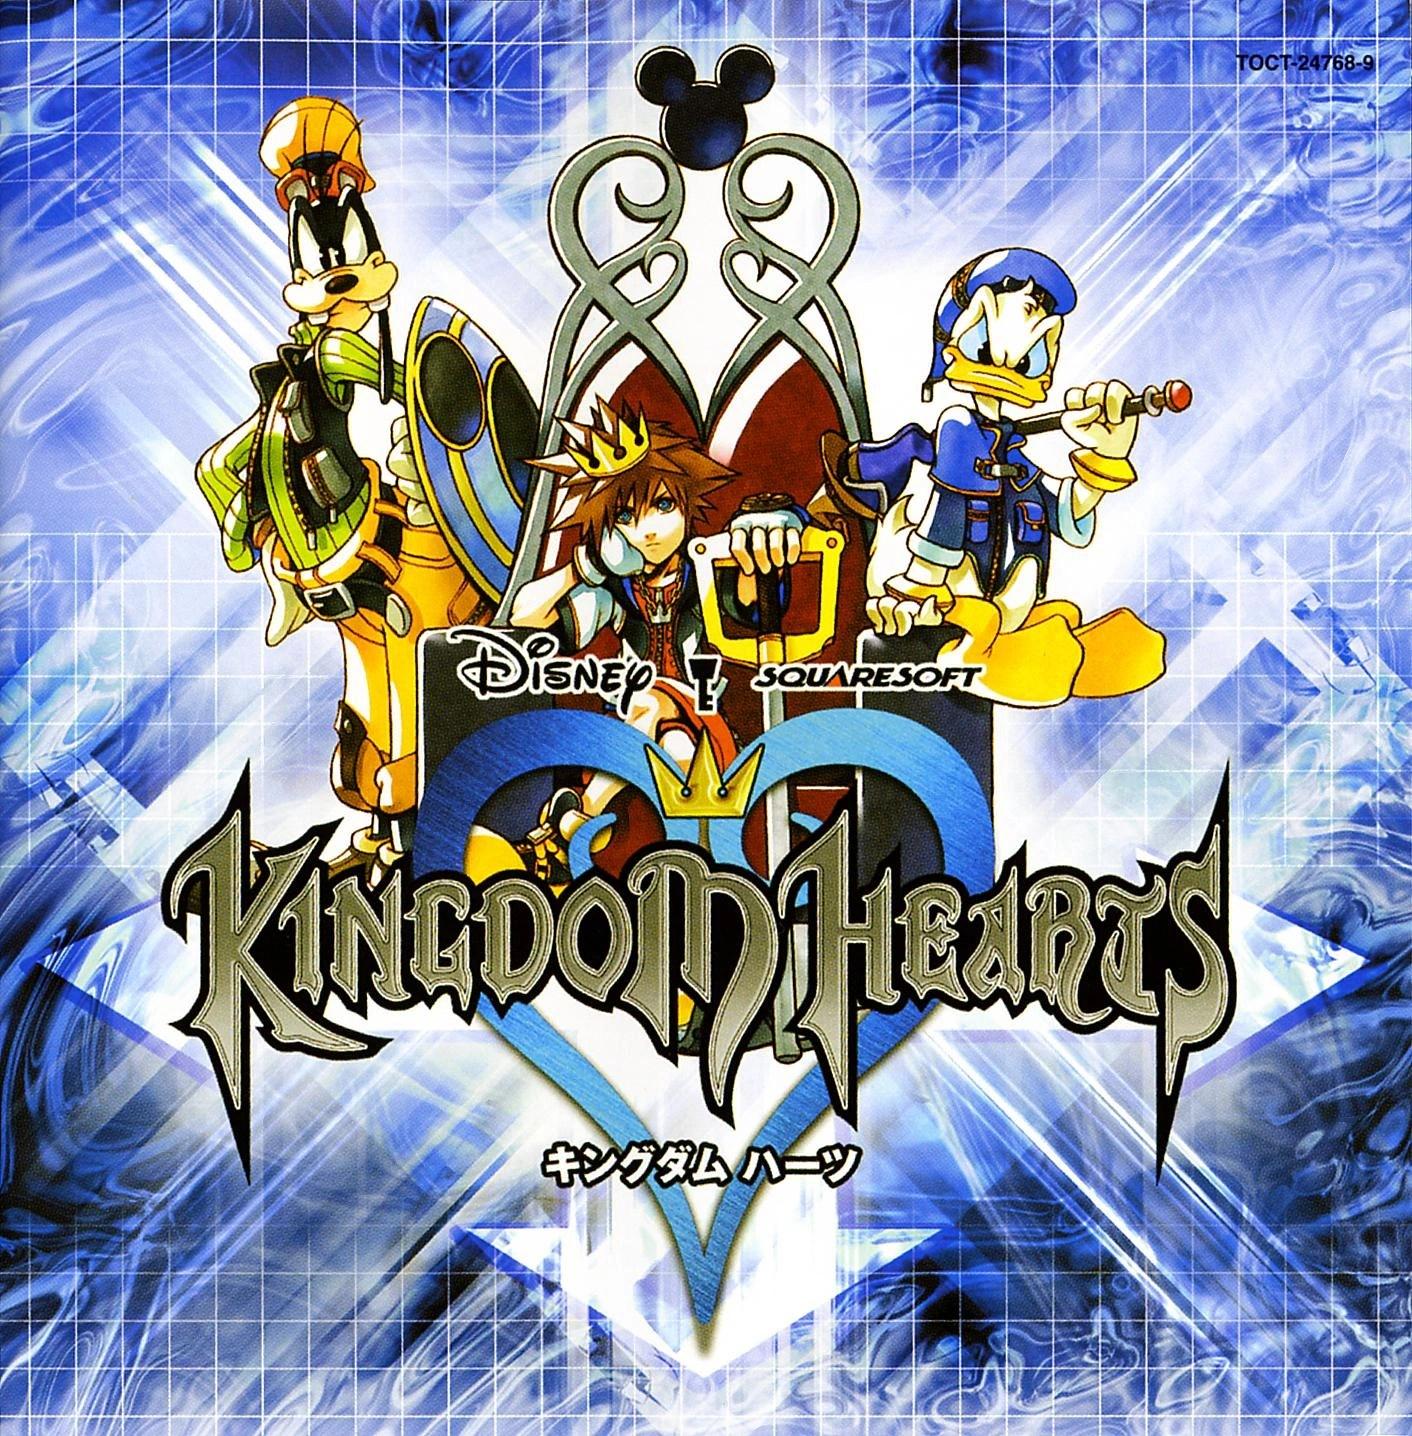 Chip And Dale Wallpaper Hd Kingdom Hearts Original Soundtrack Disney Wiki Fandom